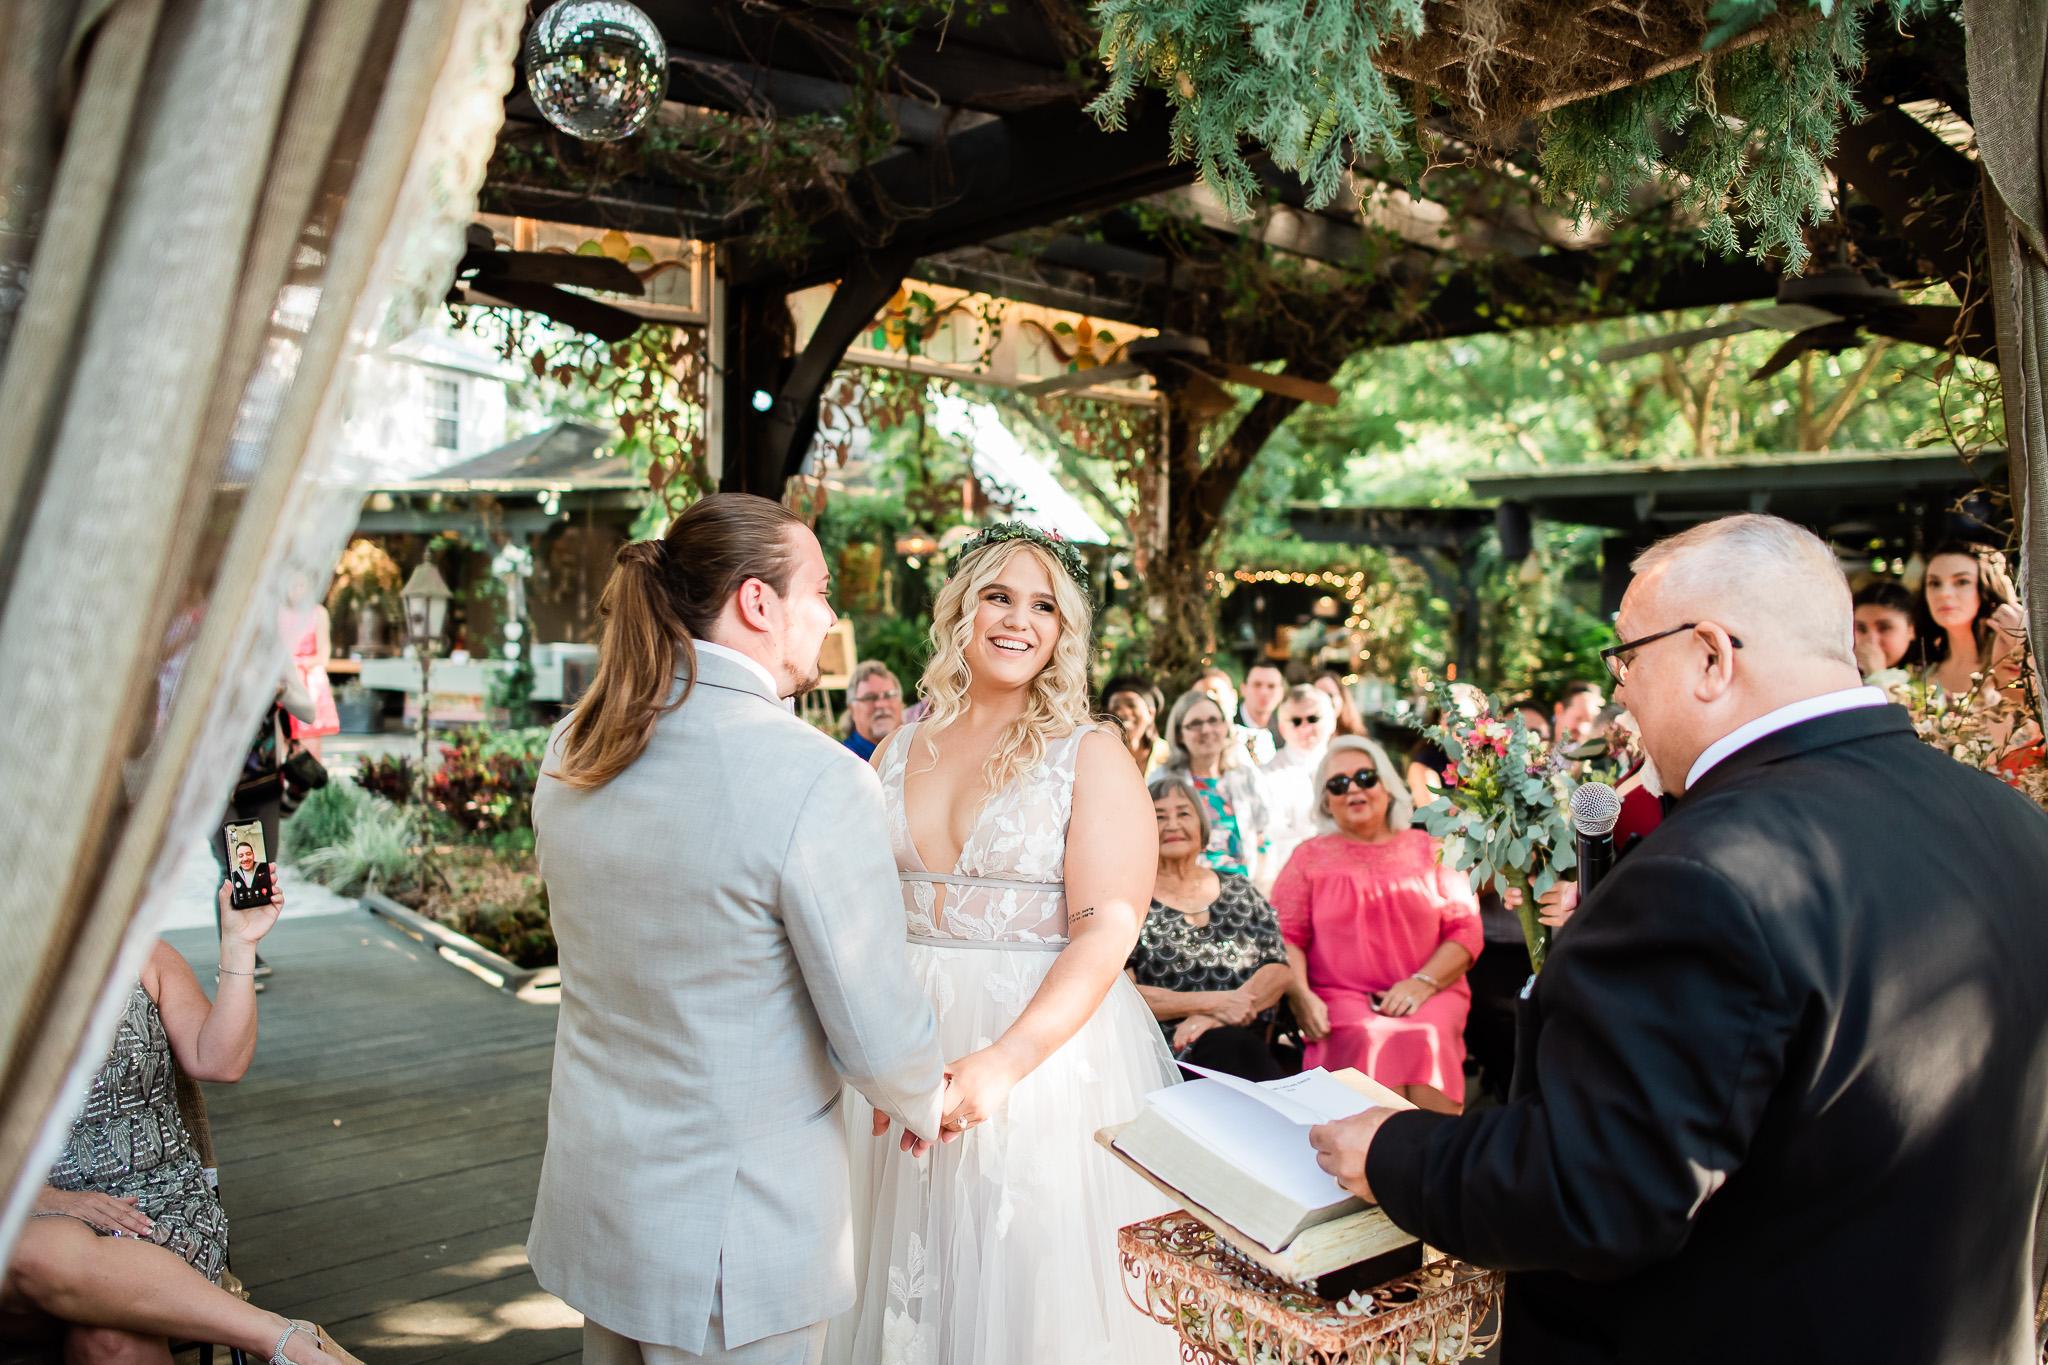 TAMPA_WEDDING_GIGIS_COUNTRY_GARDEN_CJMZ_D82_4576.jpg